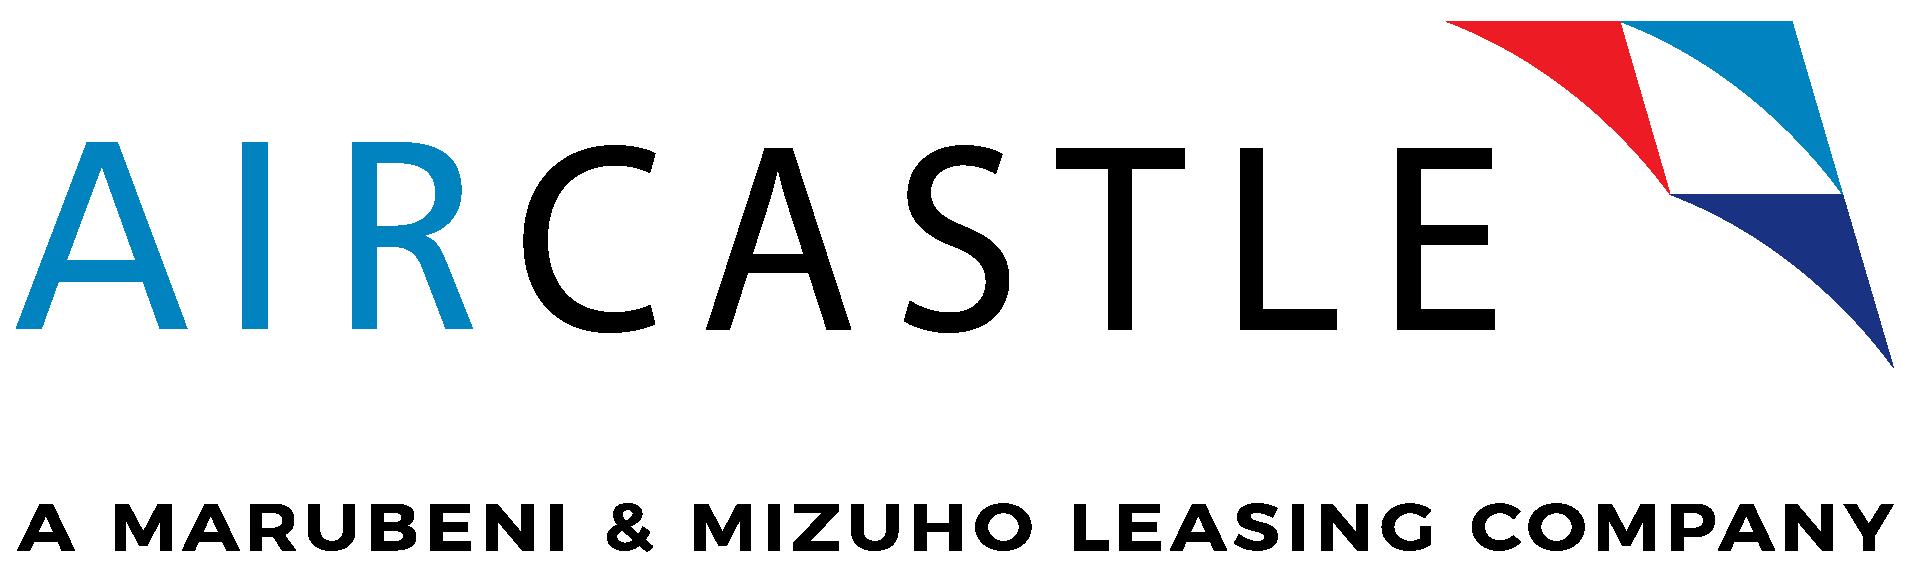 https://cdn.kscope.io/78e13a4ac7366c5e53295f4d11c01ff5-image_0.jpg